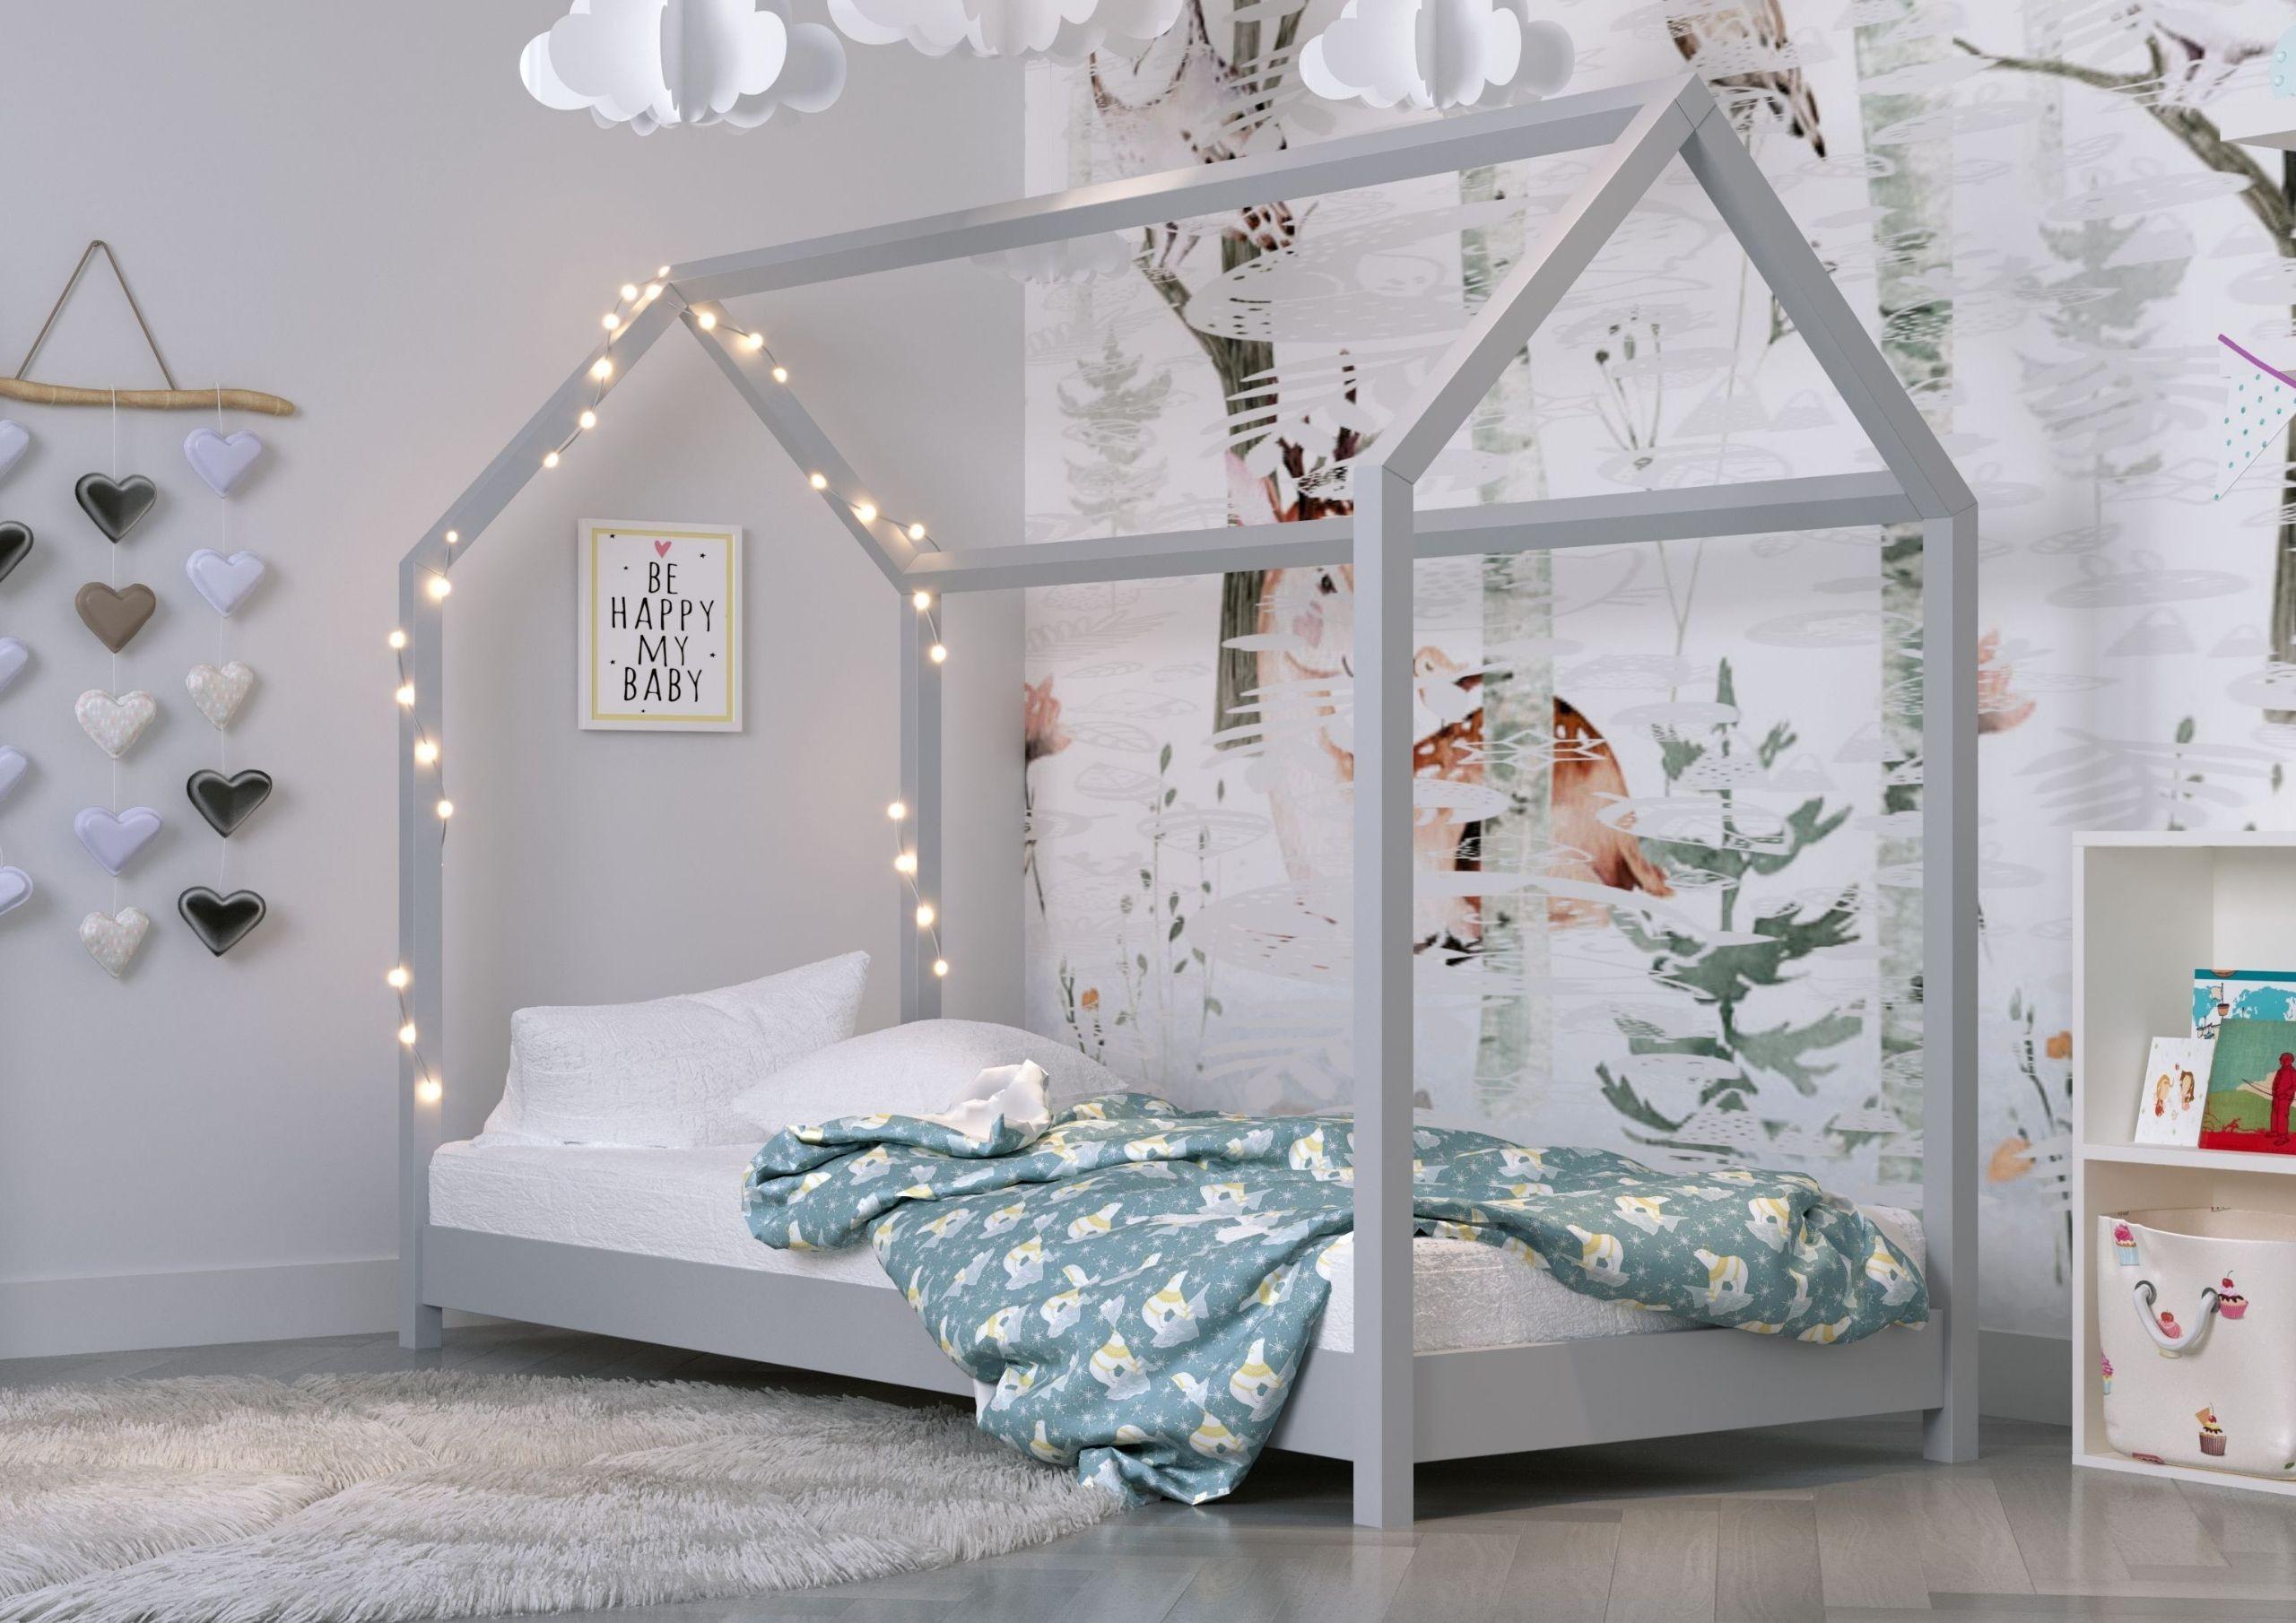 Montesori House Bed - Kofi Natural